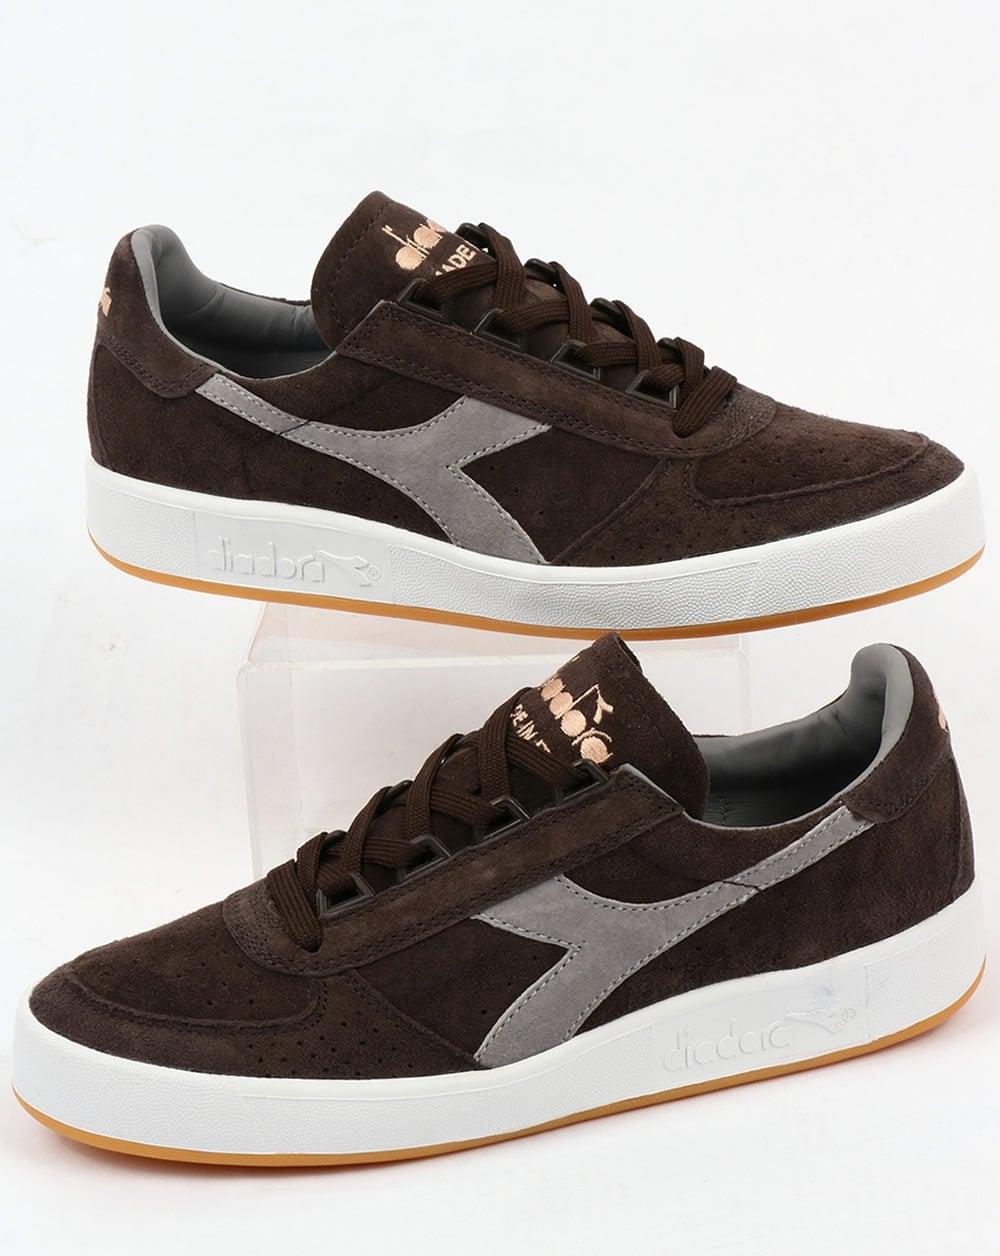 Buy Here Pay Here Ma >> Diadora B Elite Italia Suede Trainers Brown,borg,shoes,tennis,mens